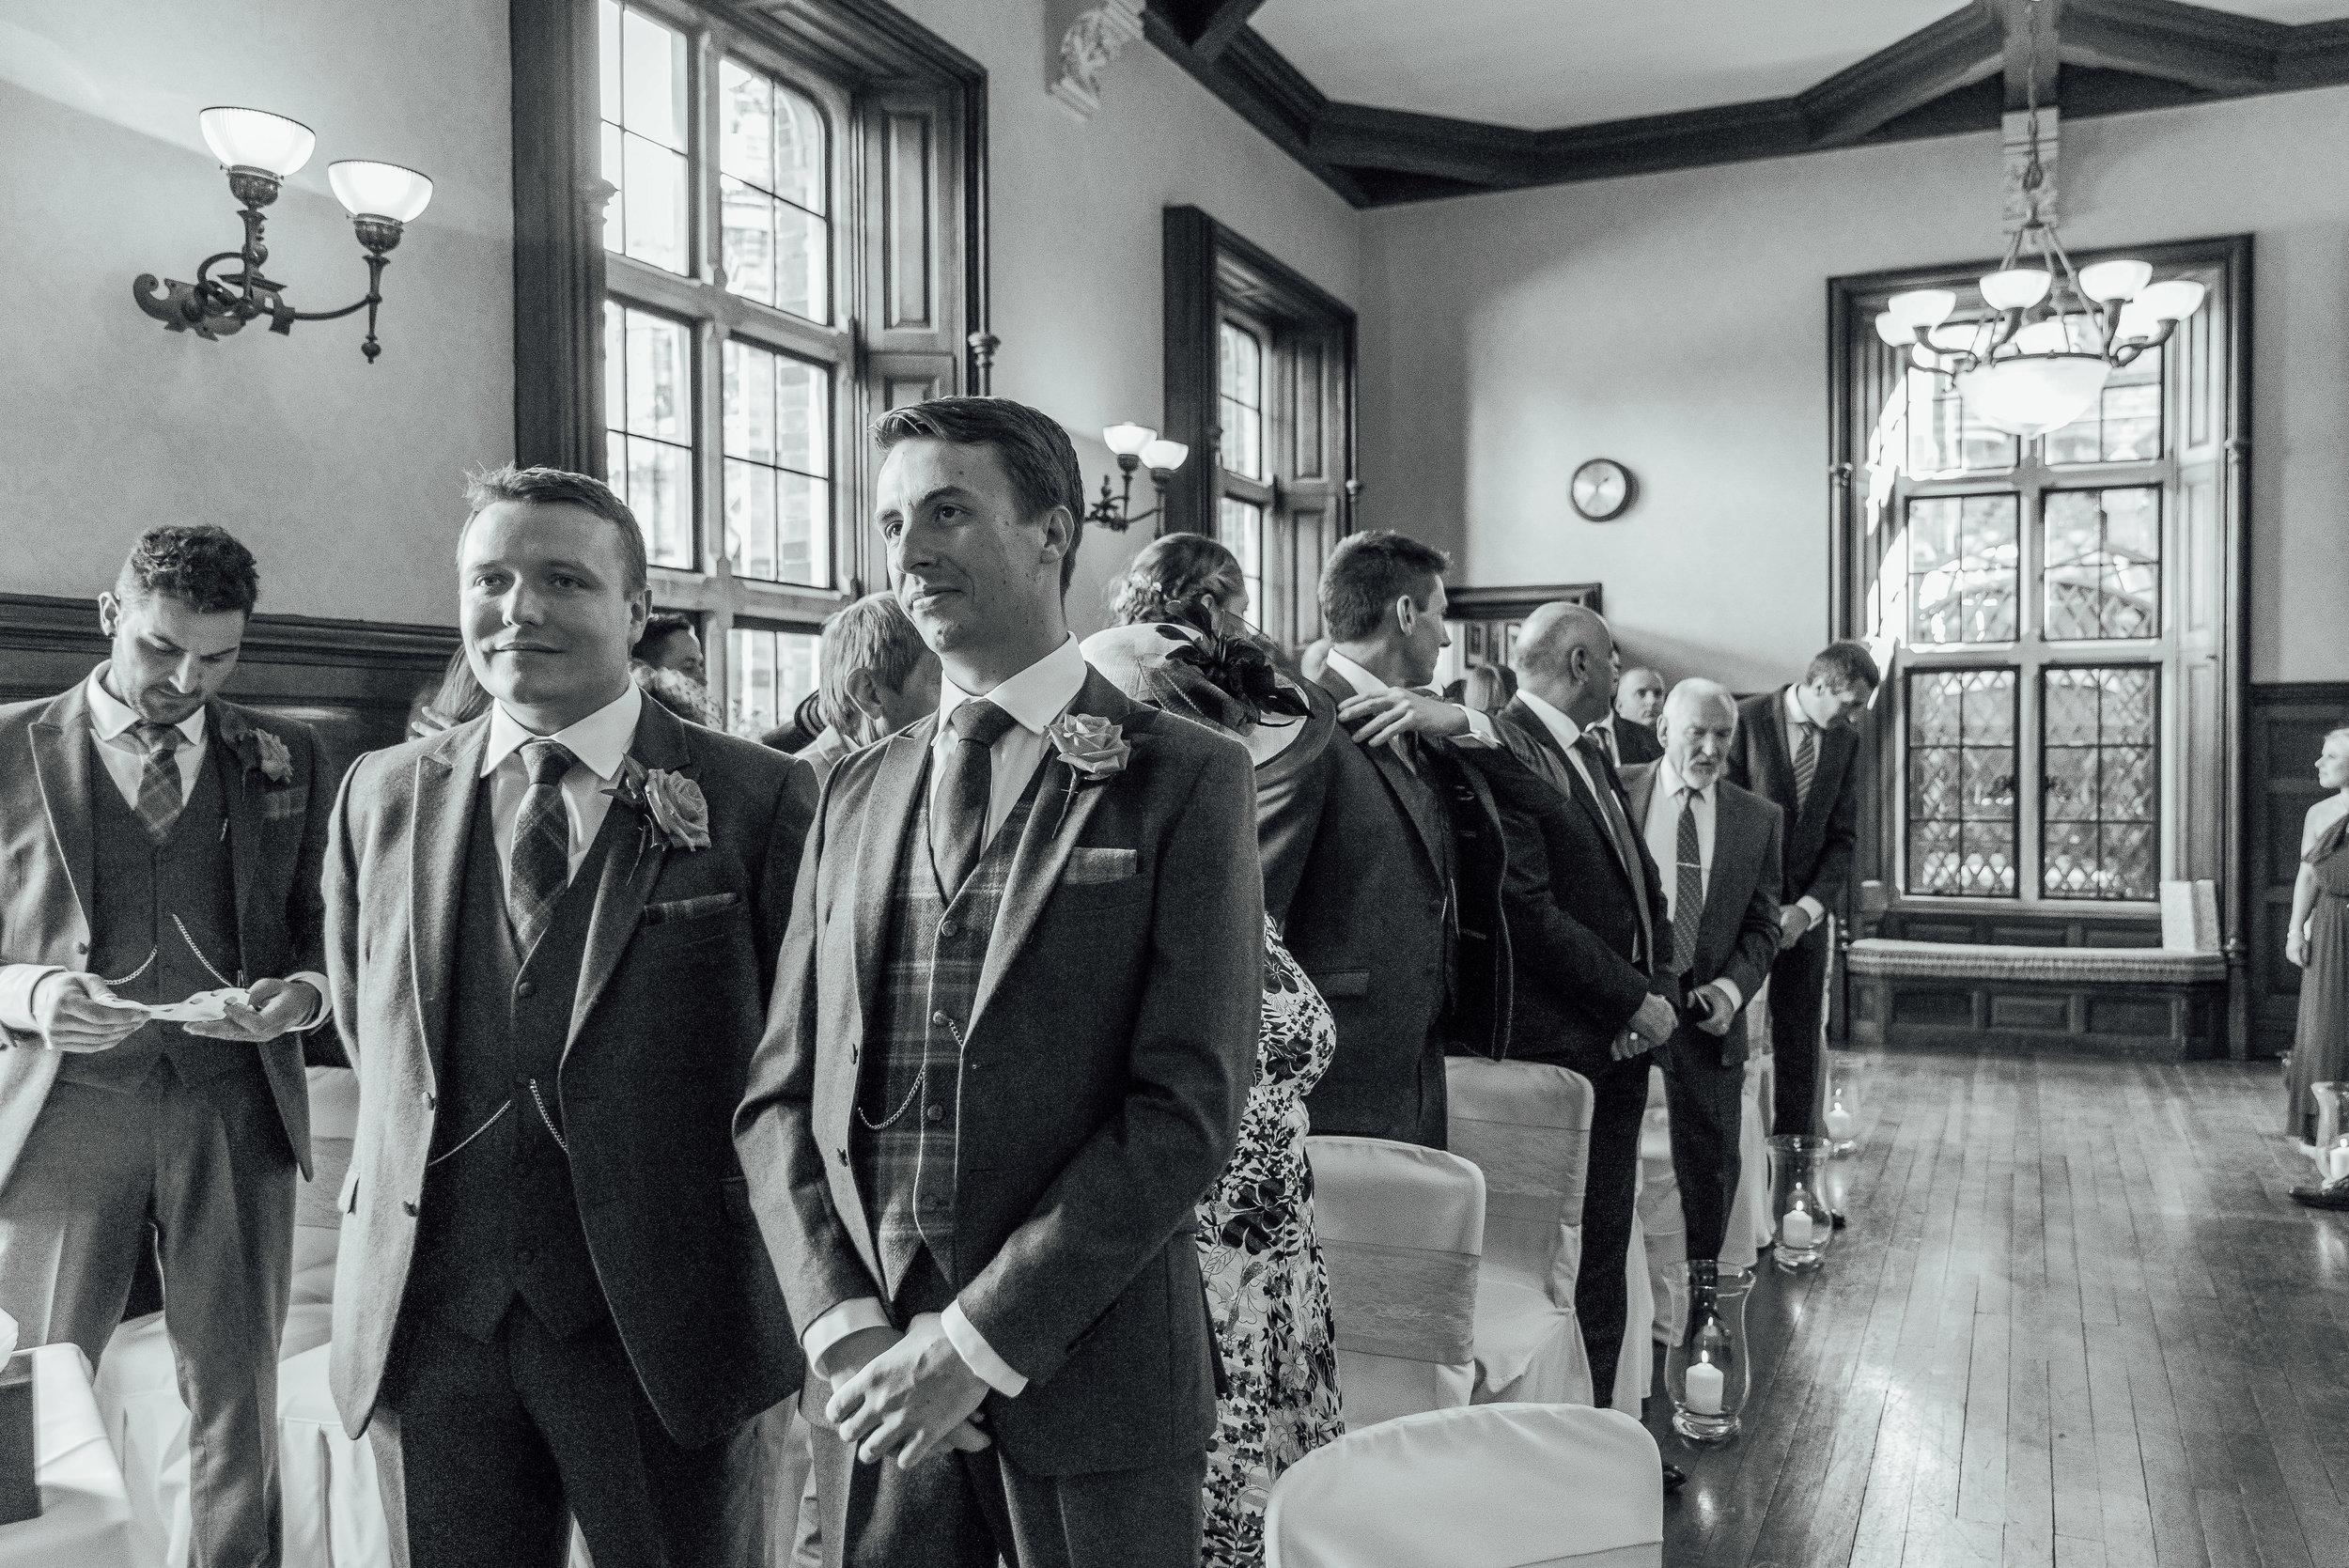 Groom awaiting arrival of Bride - The Elvetham Wedding Venue - Amy James Photography - Hampshire wedding photographer